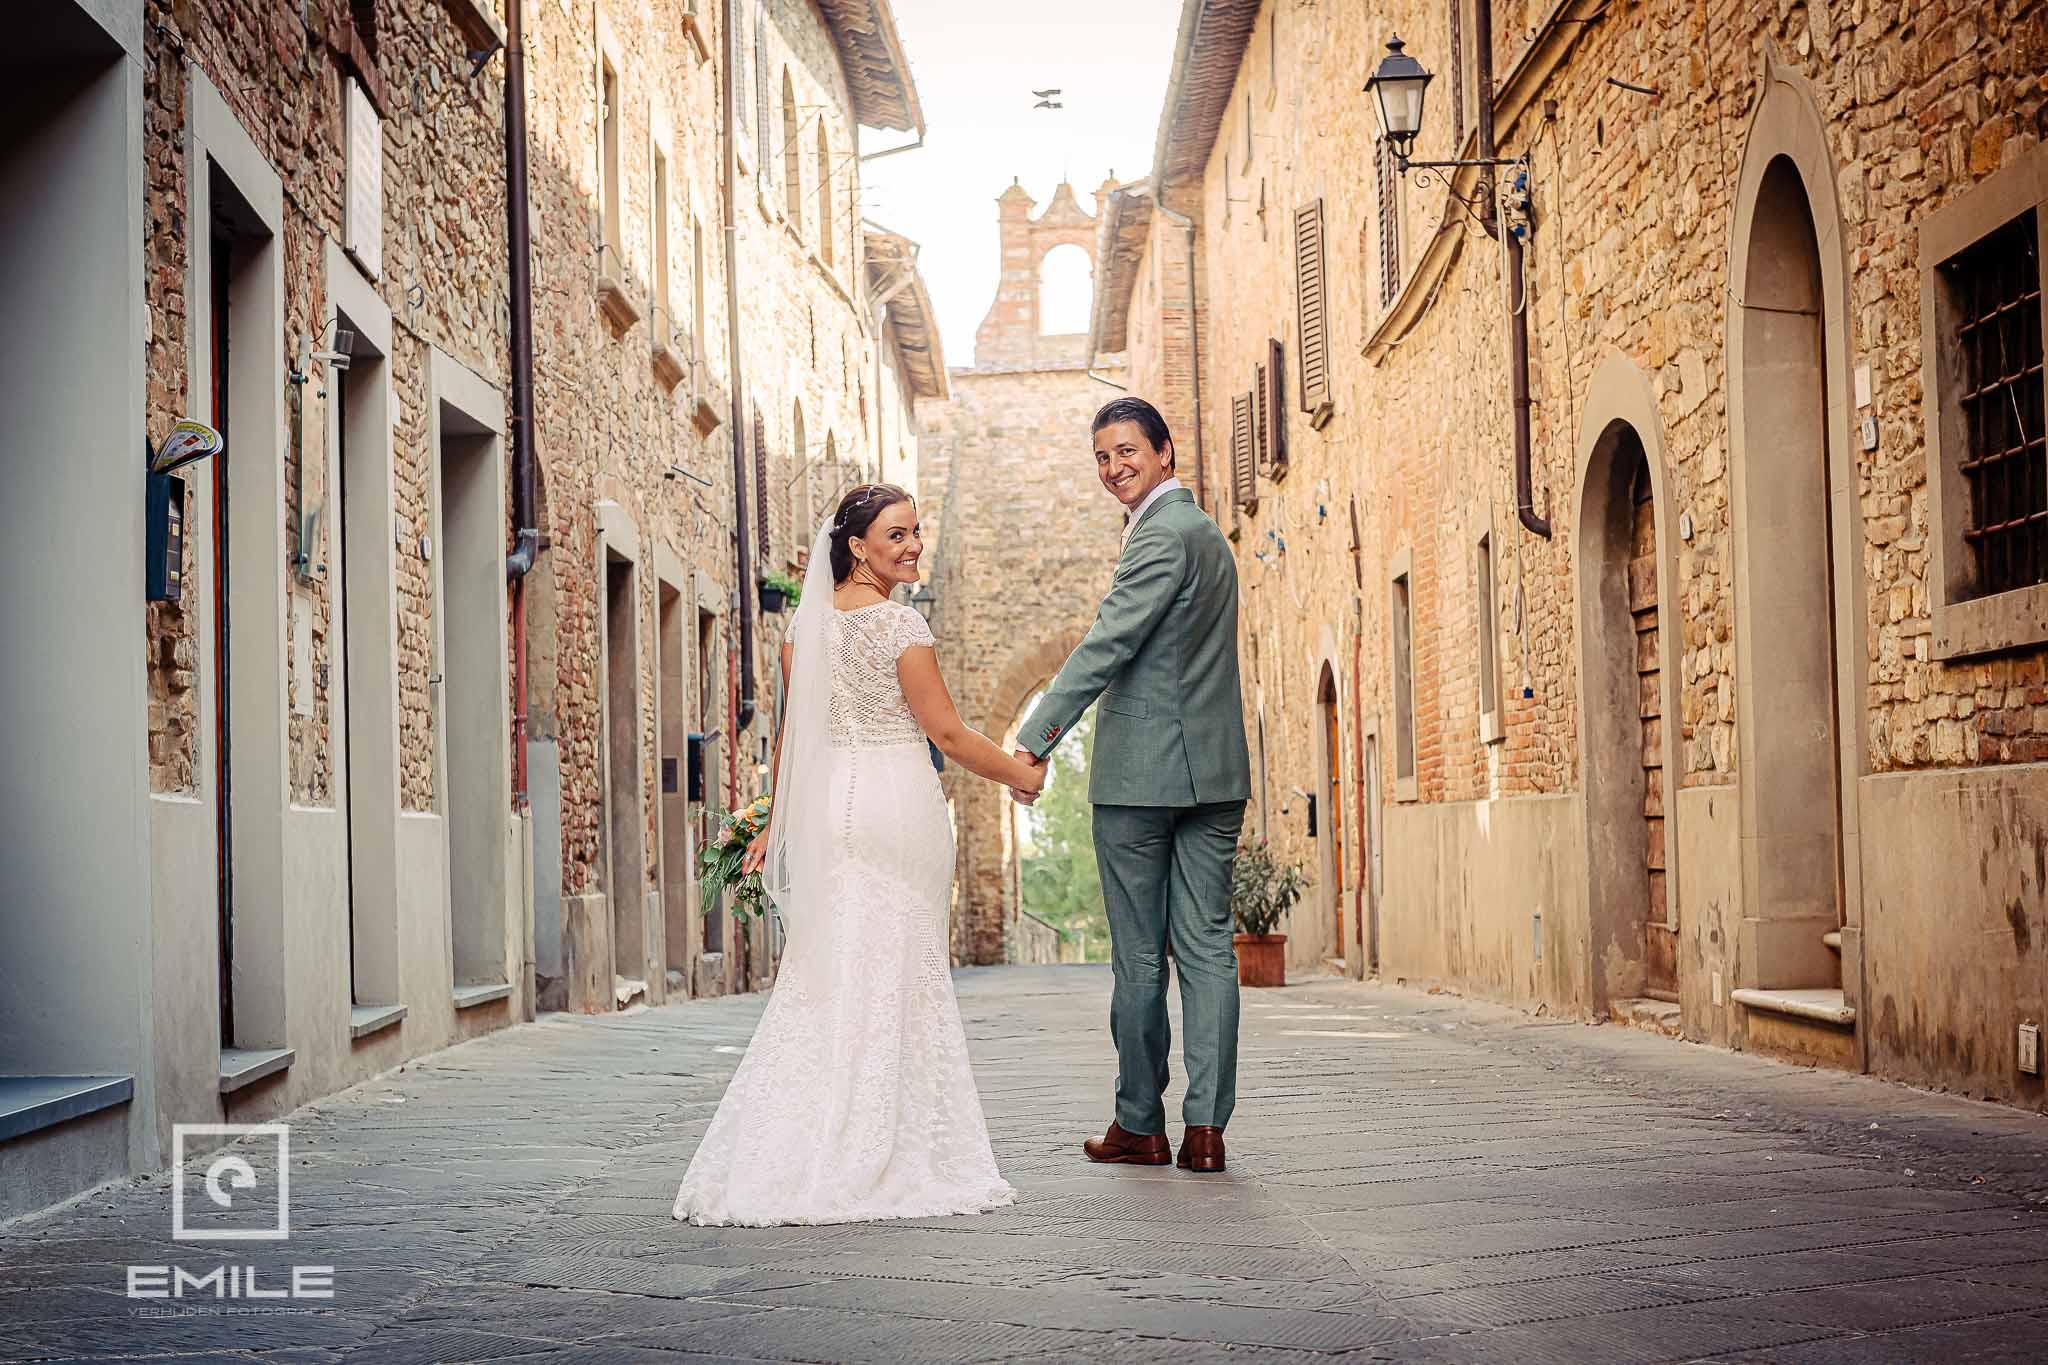 Bruidspaar in een steeg - Destination wedding San Gimignano - Toscane Italie - Iris en Job